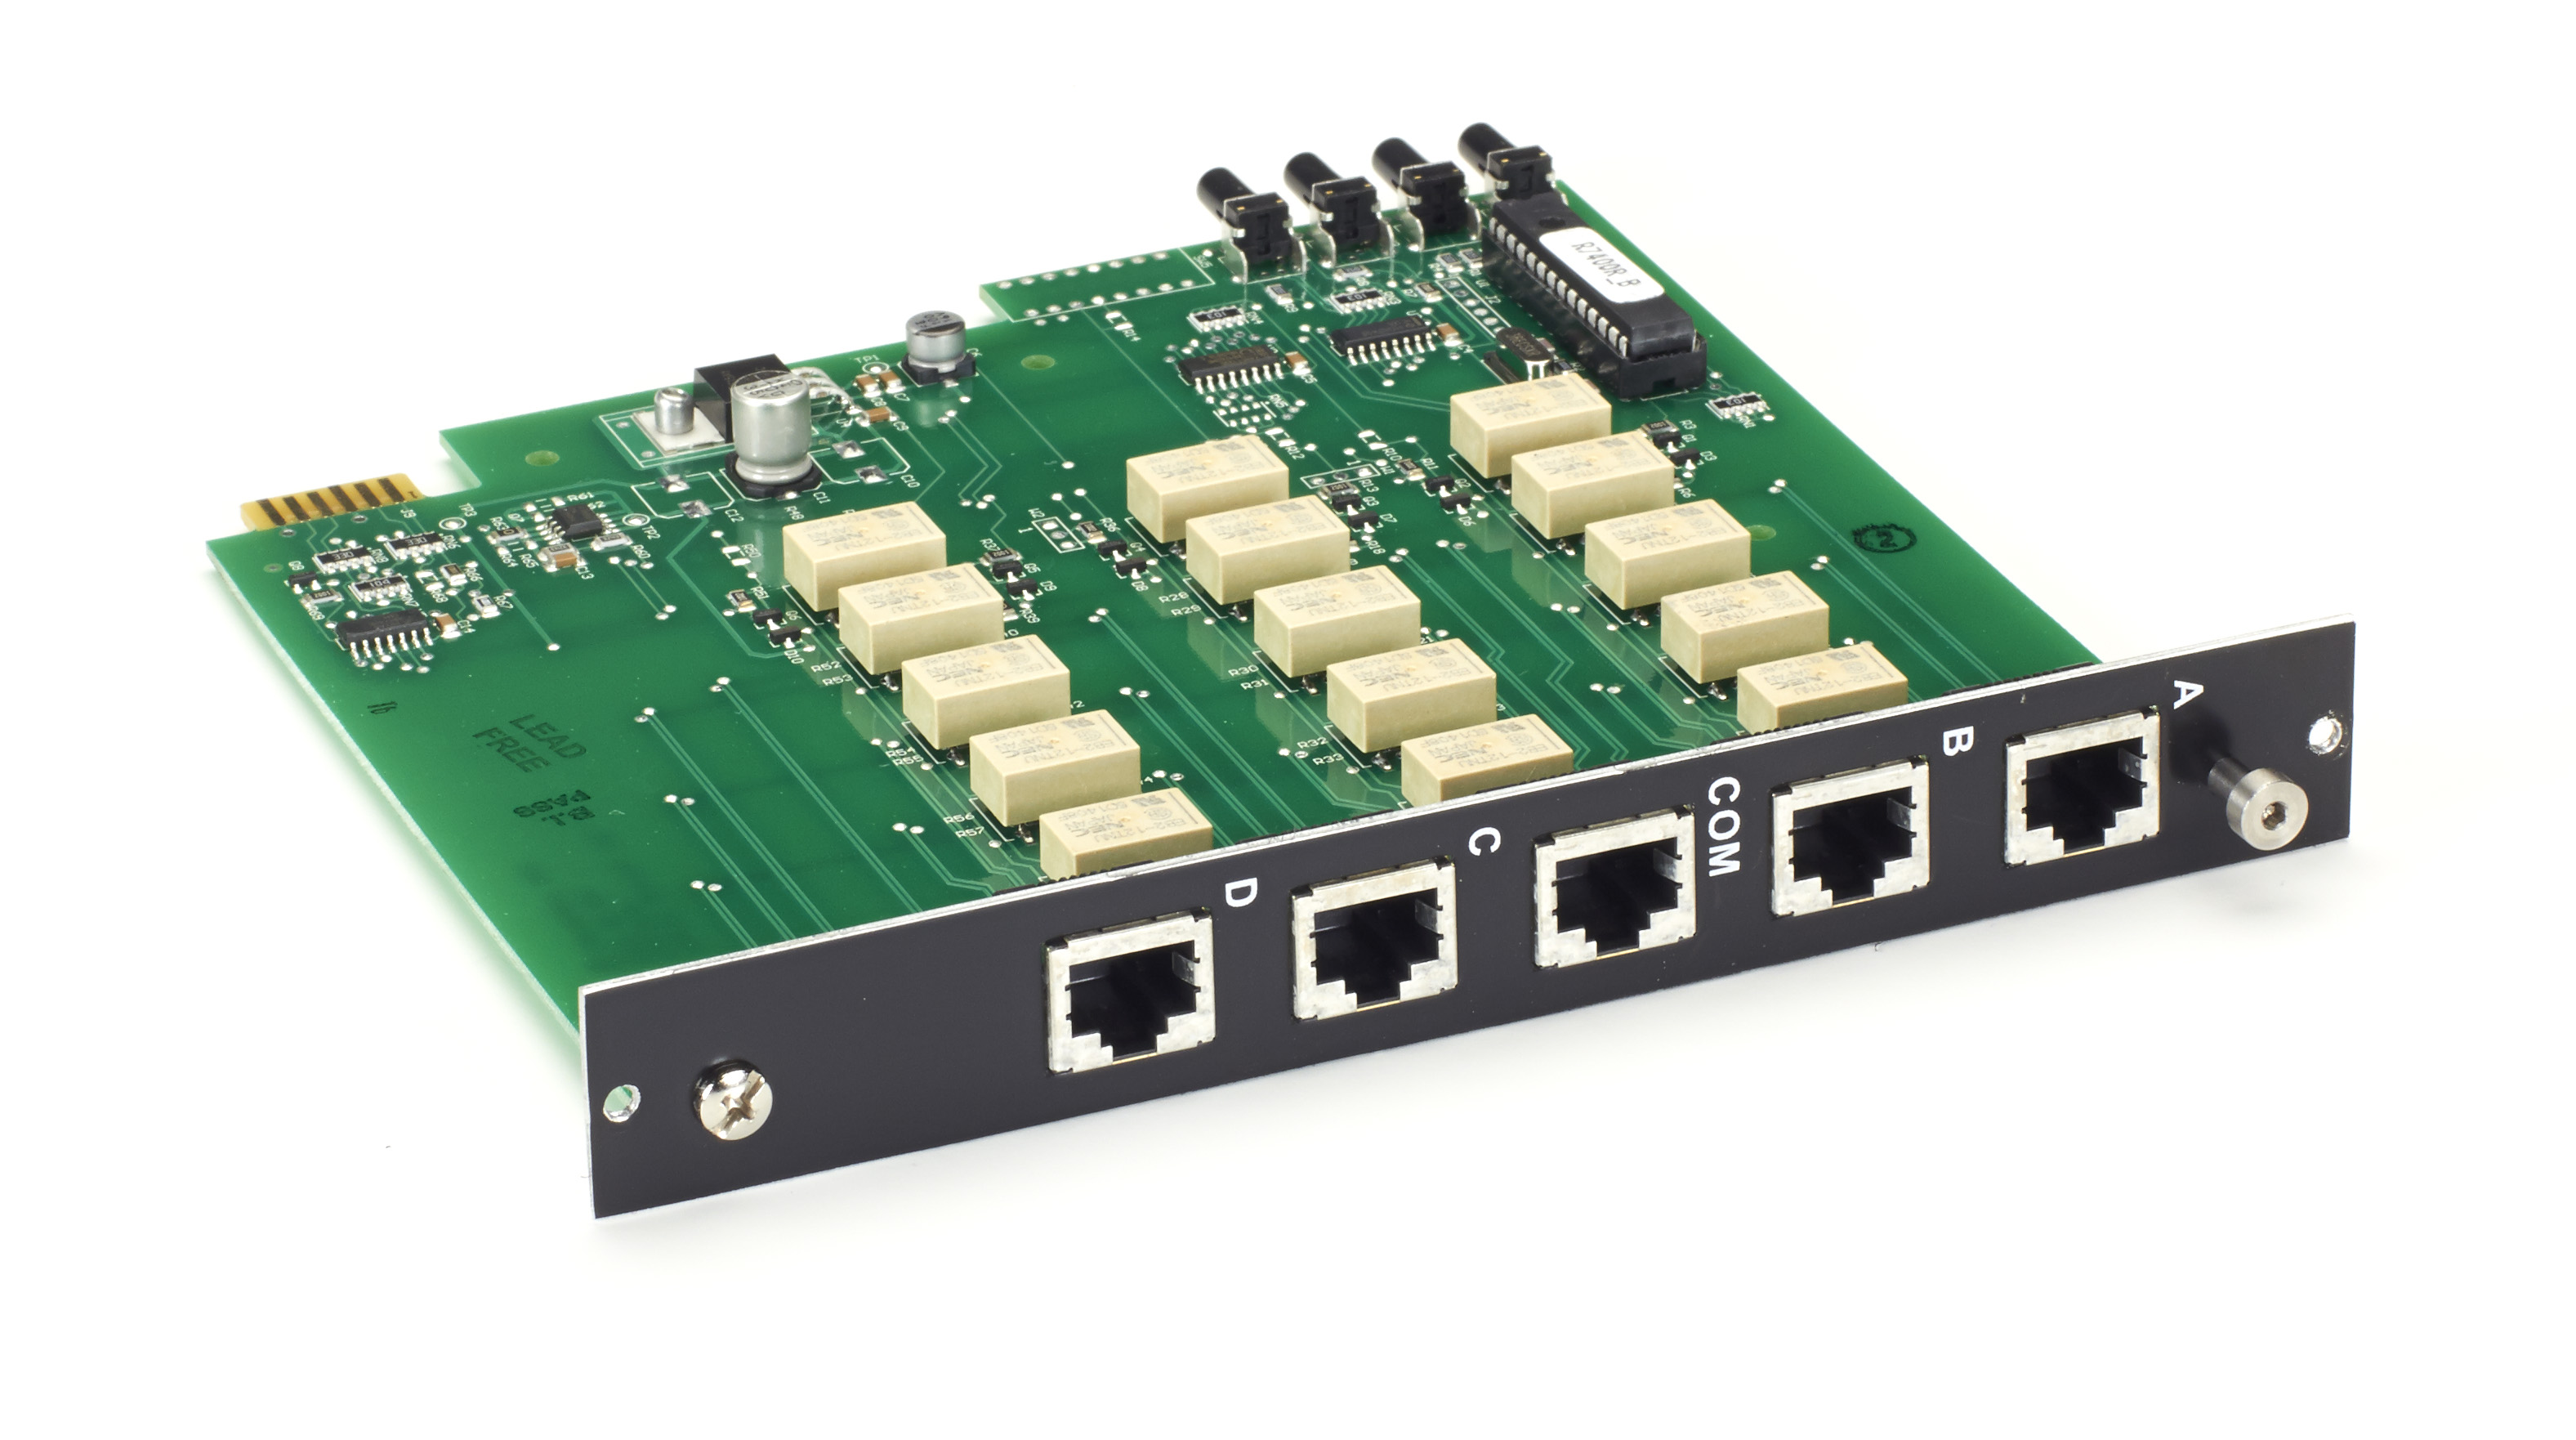 4u Gang Switch Rj45 Cat5e A B C D Card Latching Black Box Push Button Power Circuit Additional Product Image